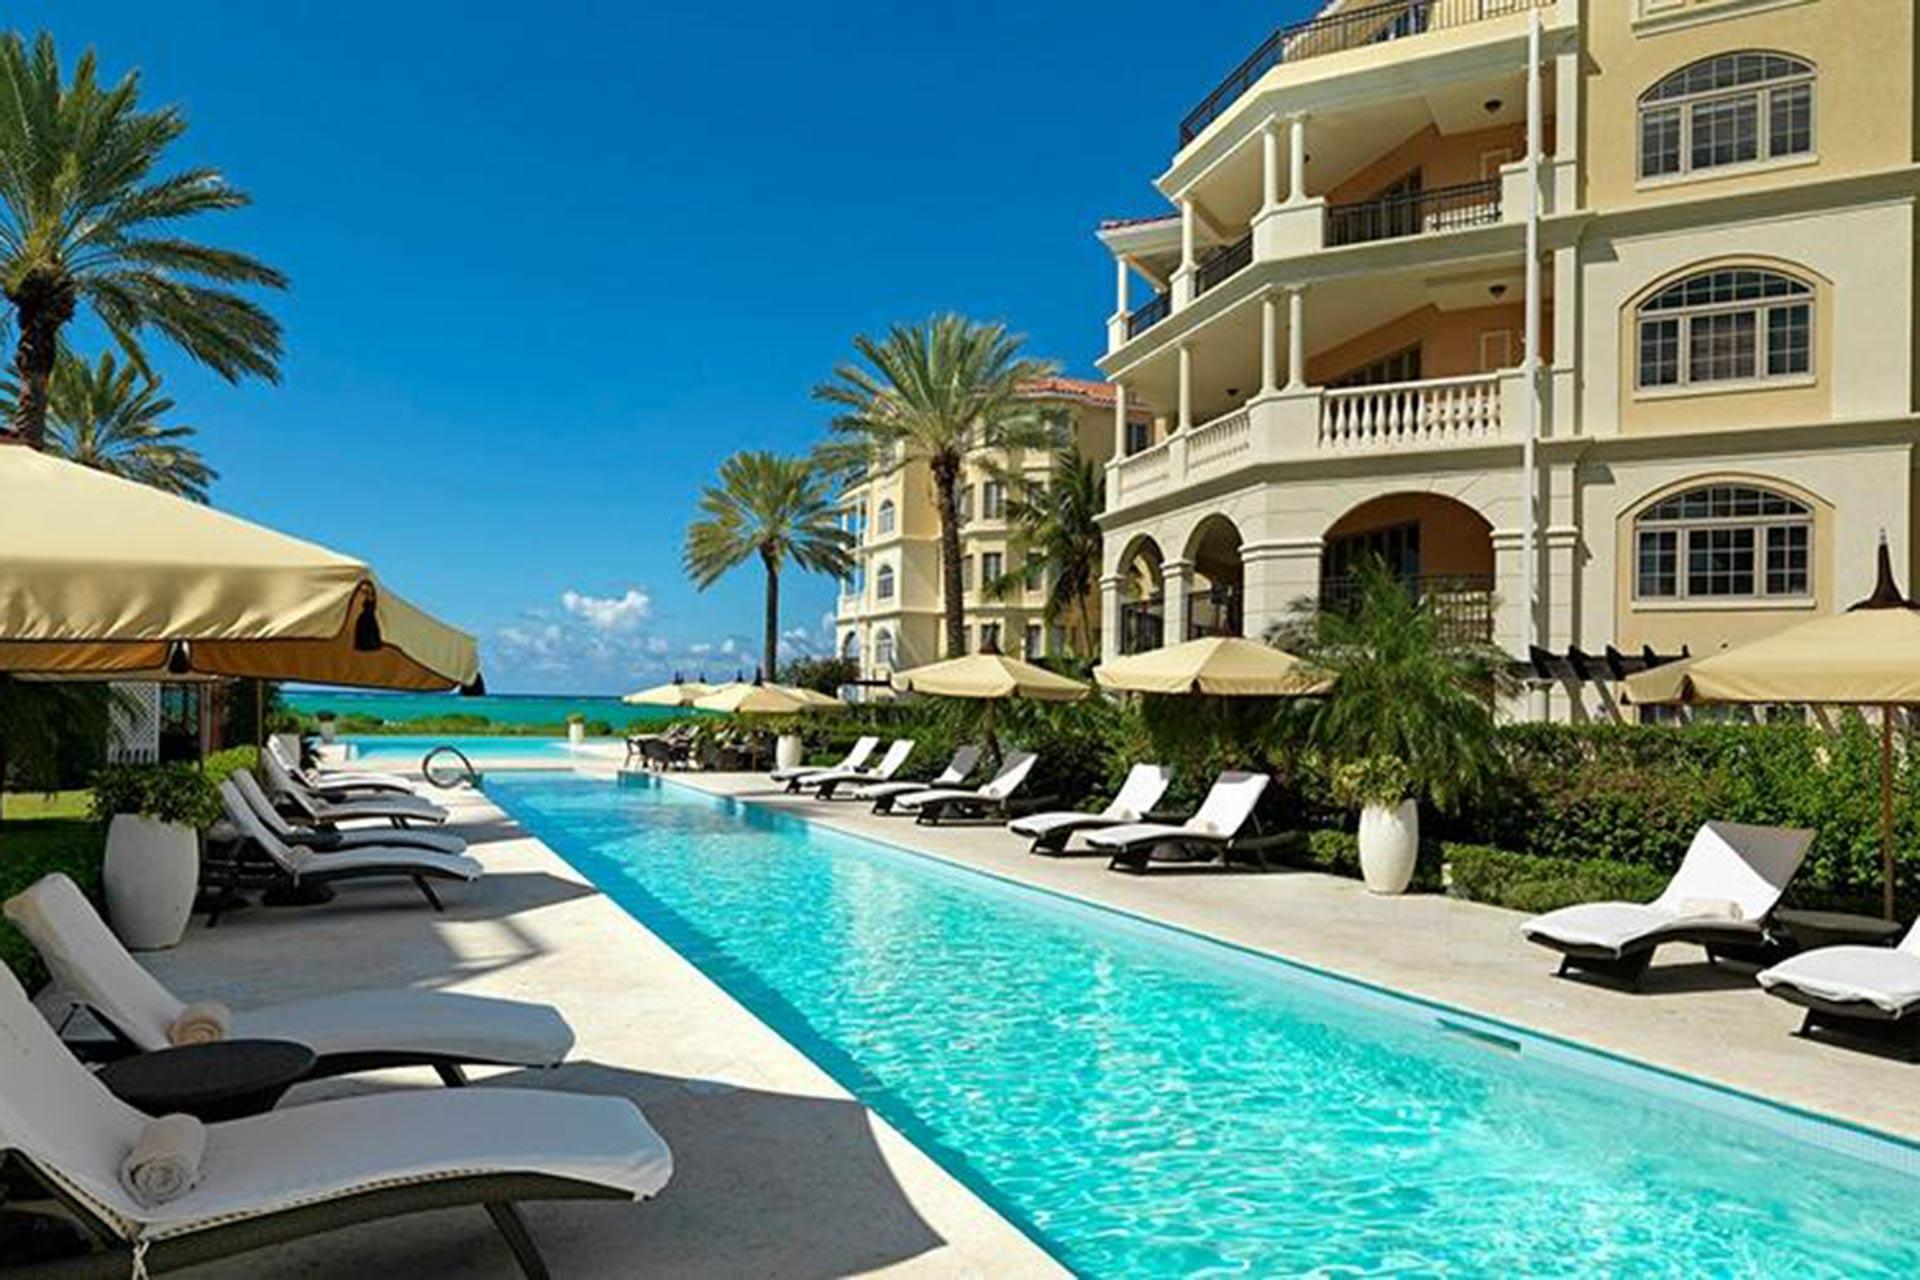 12 Best Luxury Caribbean Villa Resorts For Families